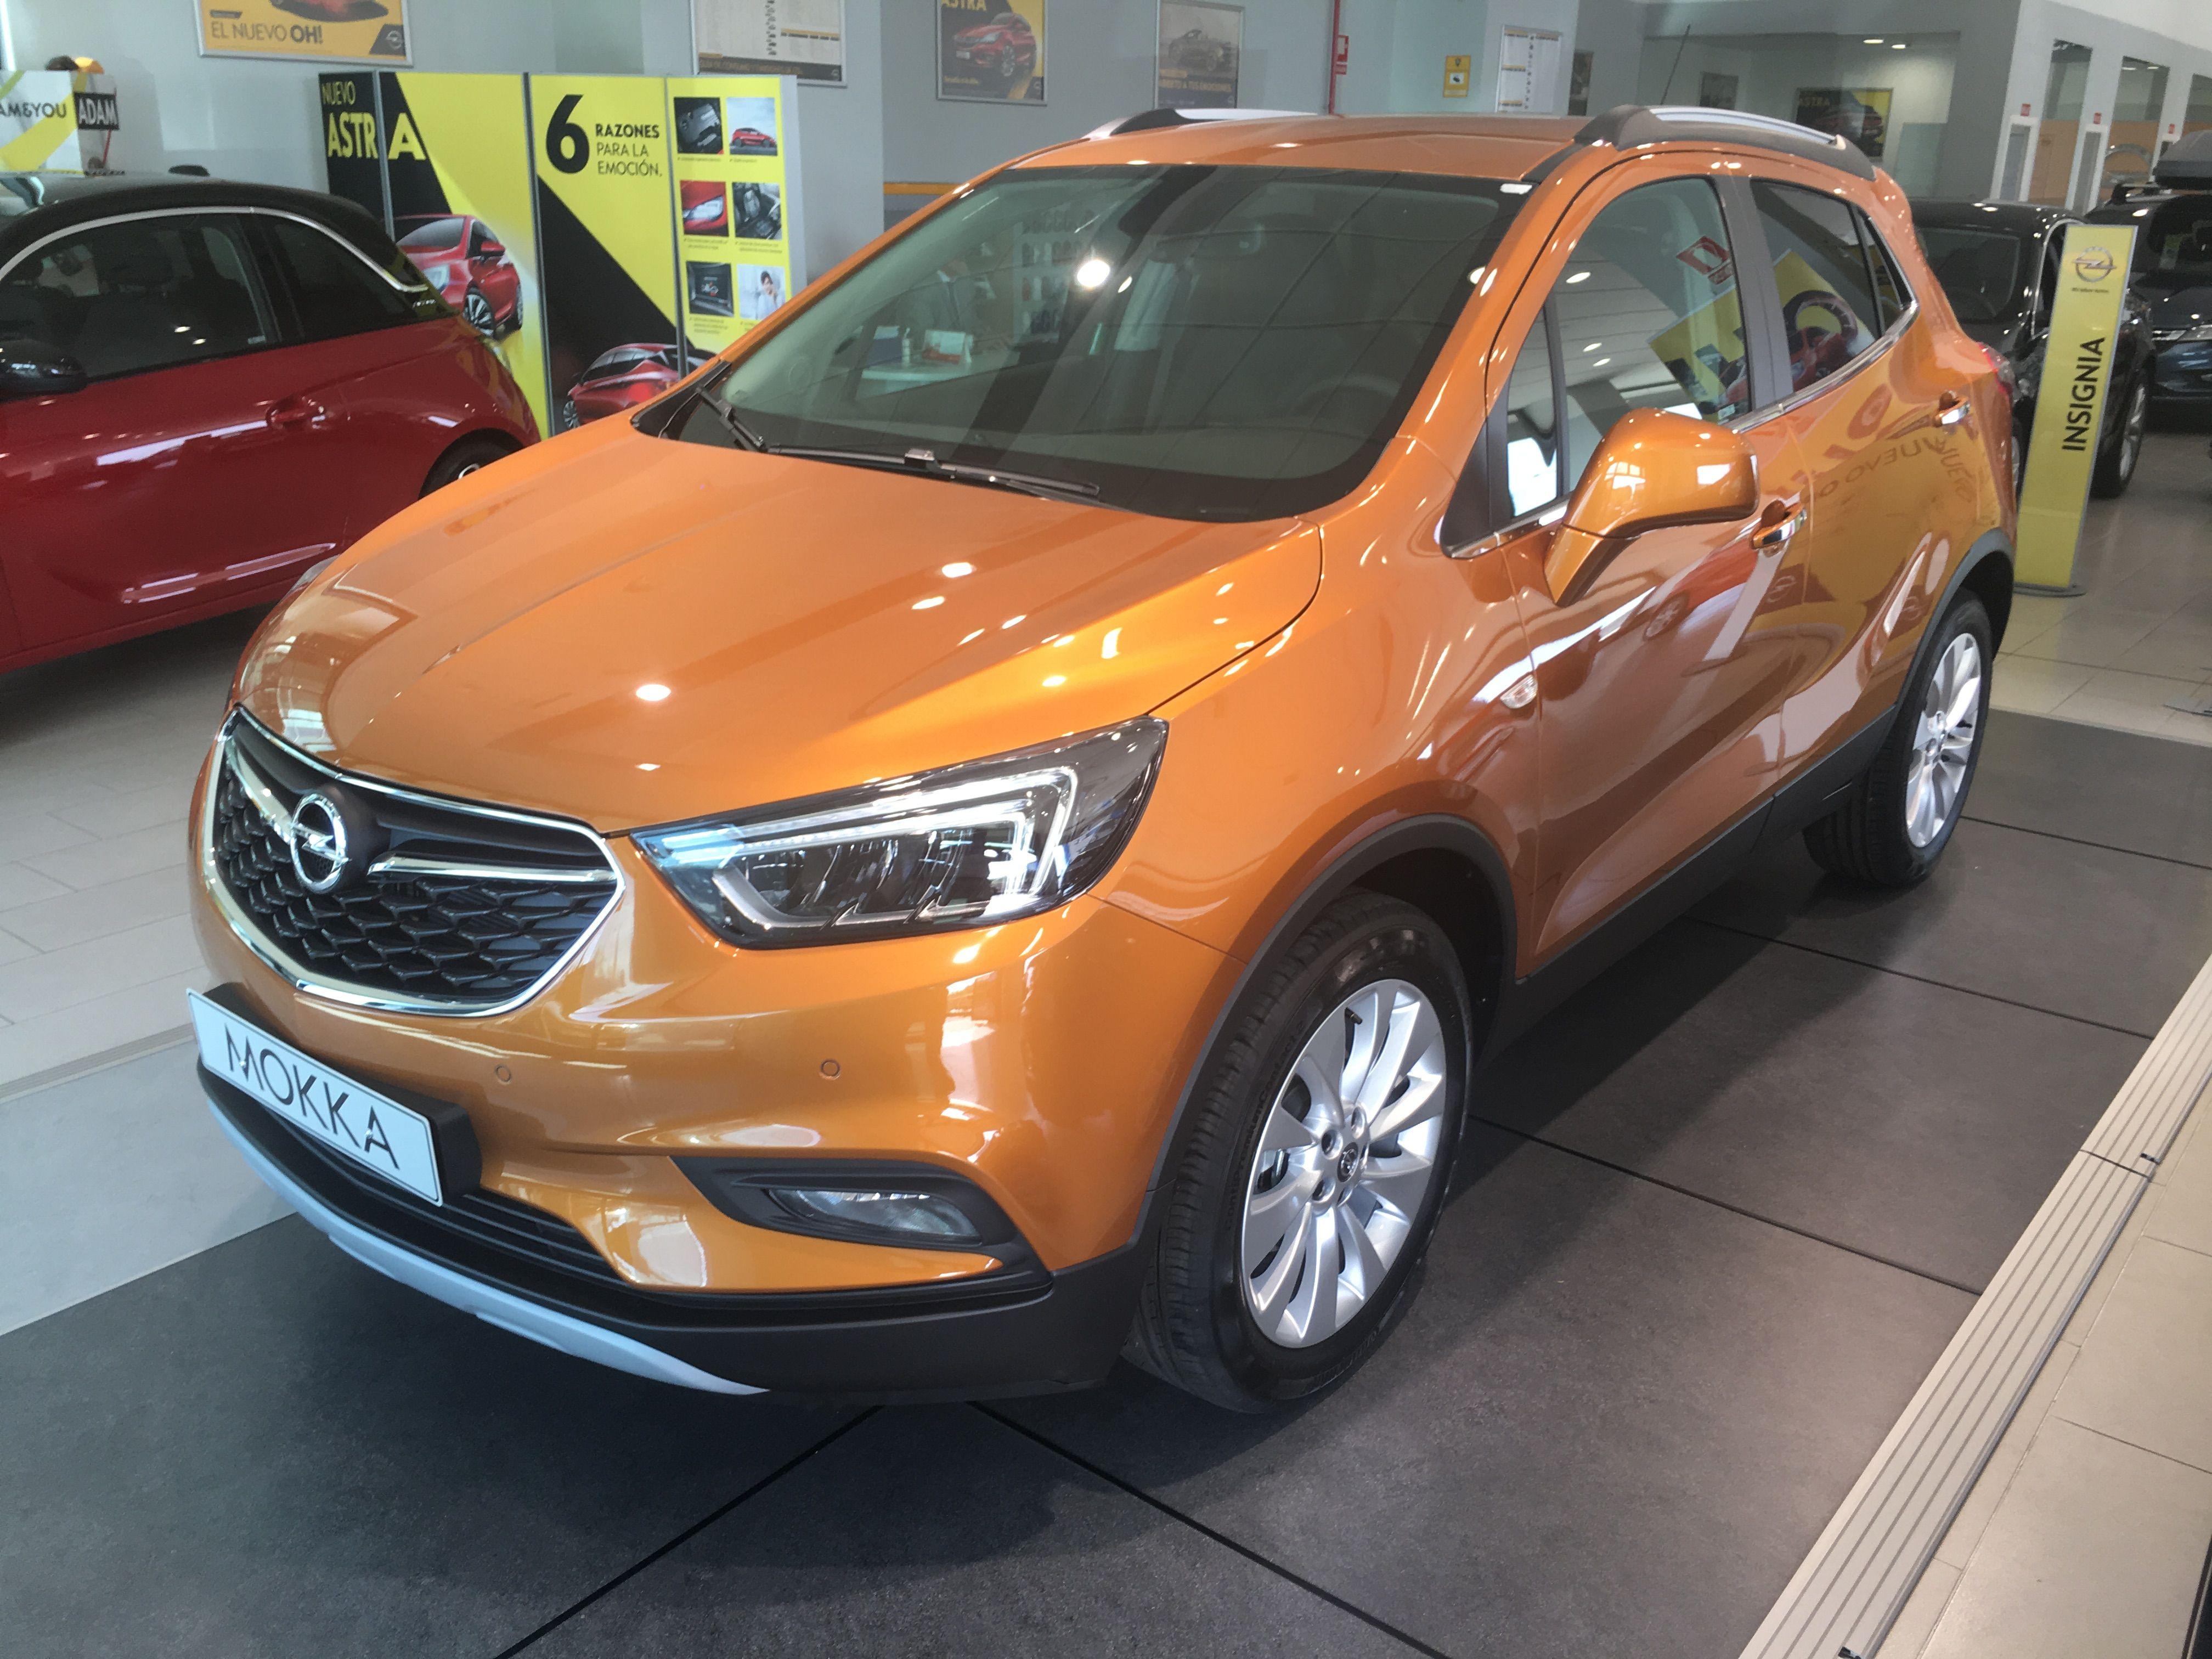 ¡¡¡¡ OFERTA ÚNICA !!!!!!ULTIMA UNIDAD / 17.690 € / Opel Mokka X Selective 1.6T 4x2 S&S 136CV